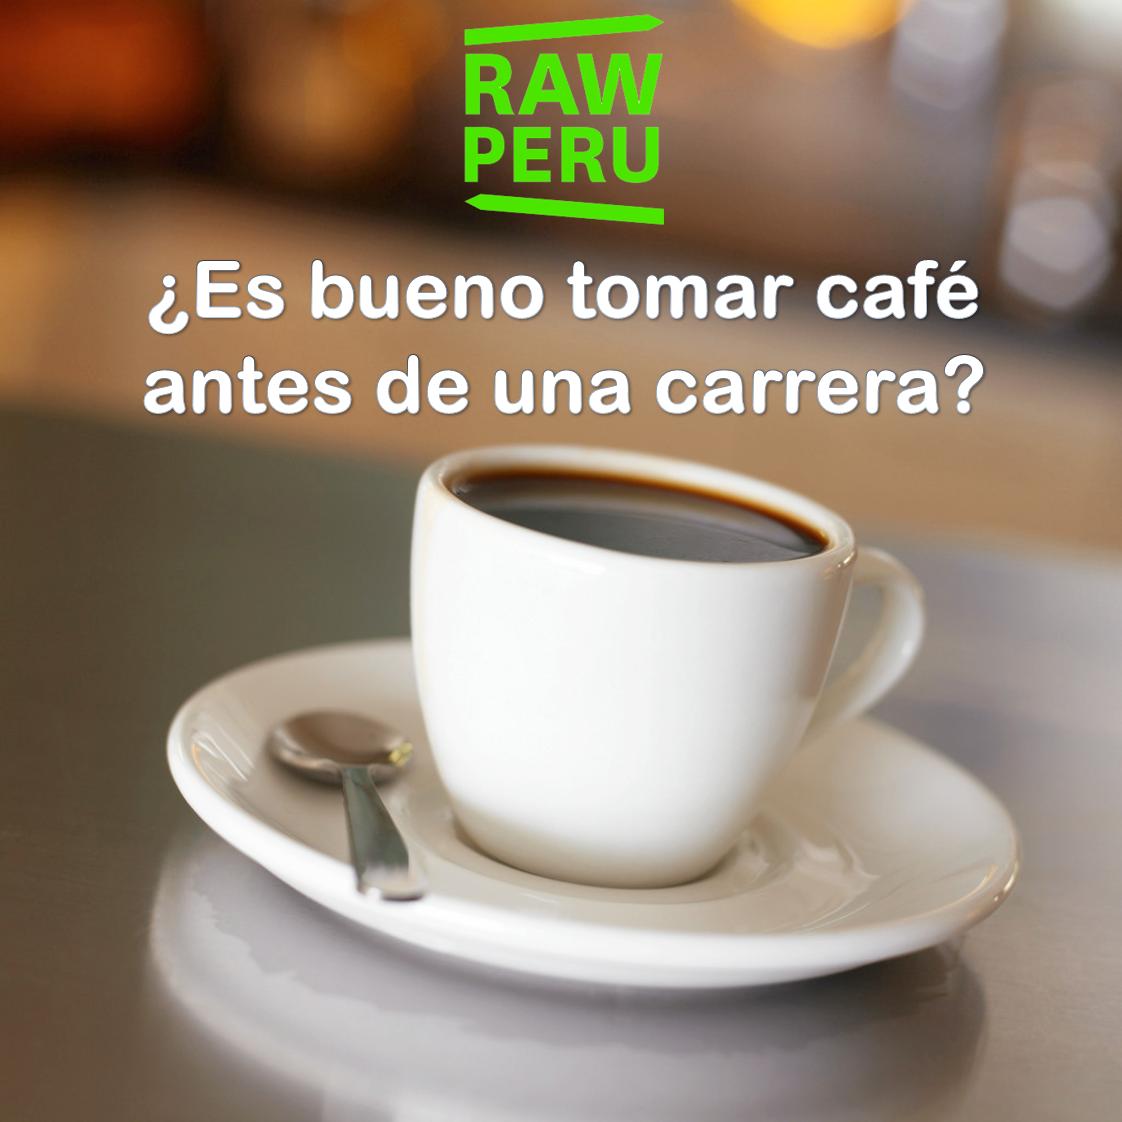 ¿Es bueno tomar café antes de la carrera? - RAW PERU